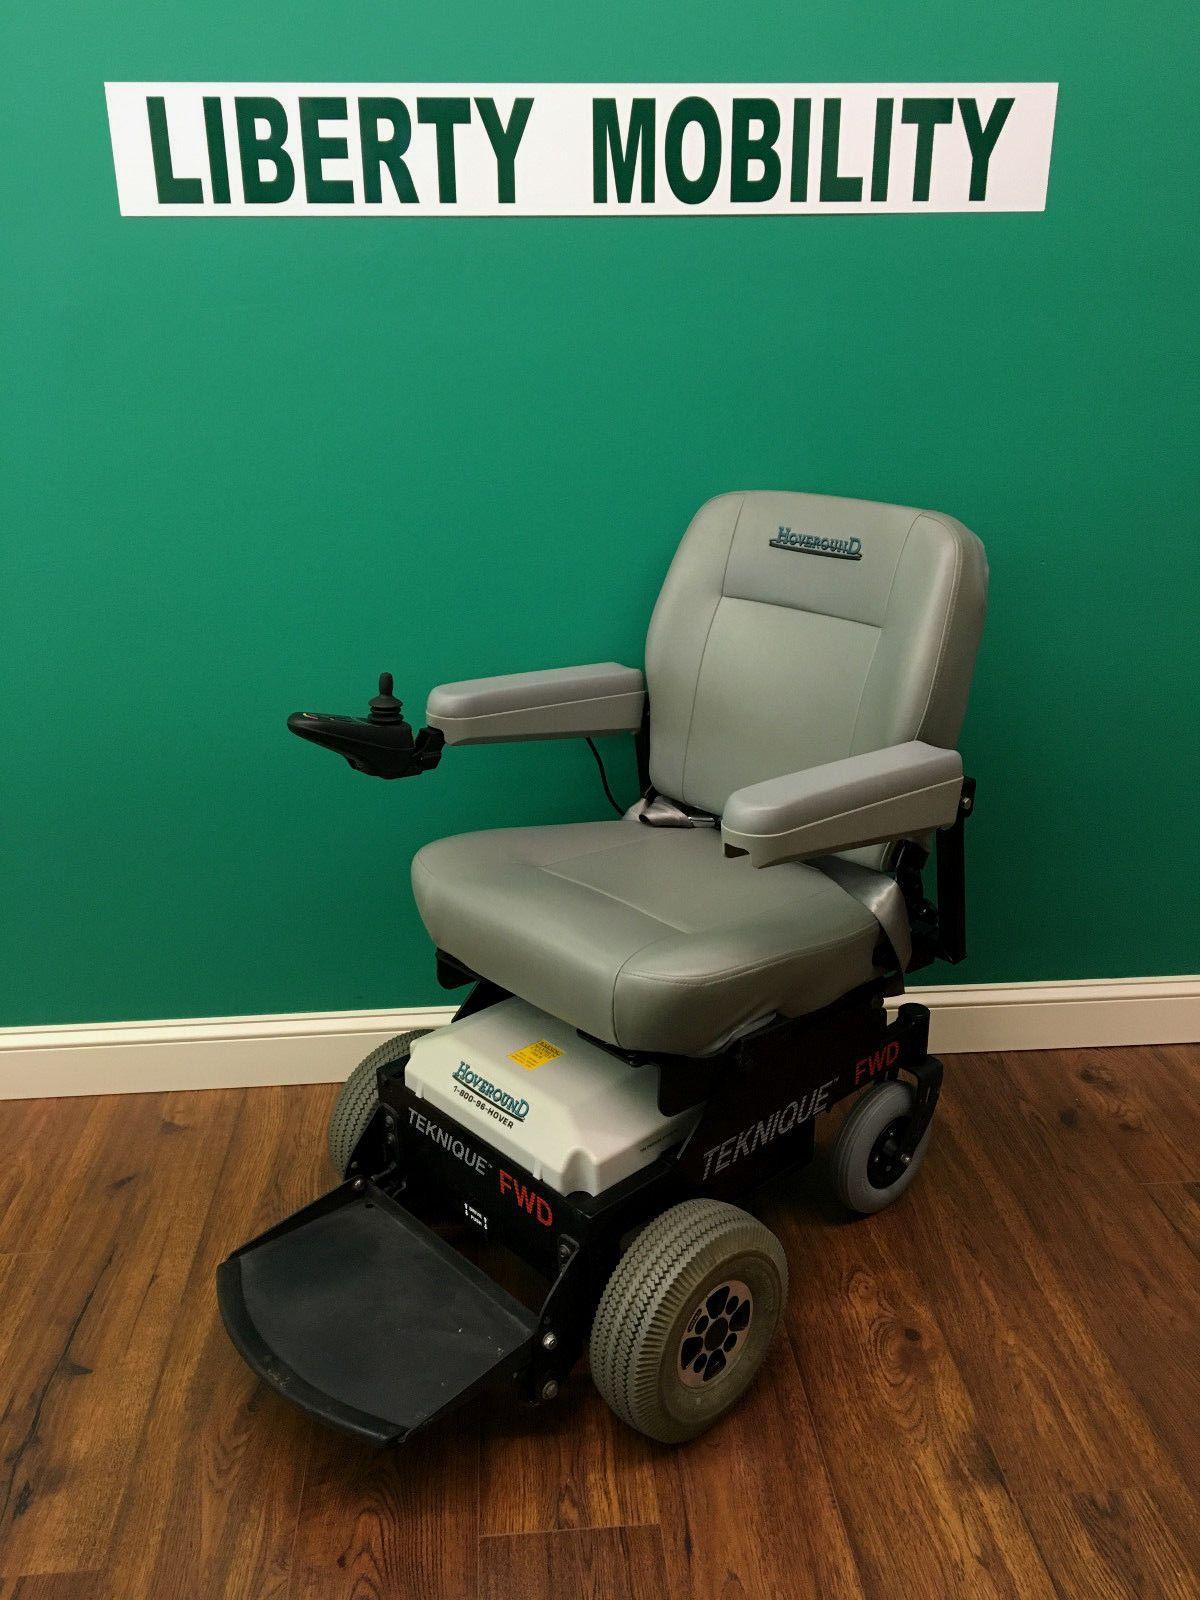 Nicole Miller Dining Chair Home Goods Natural Gear Chairs Drive Titan Axs Powerchair   Sante Blog